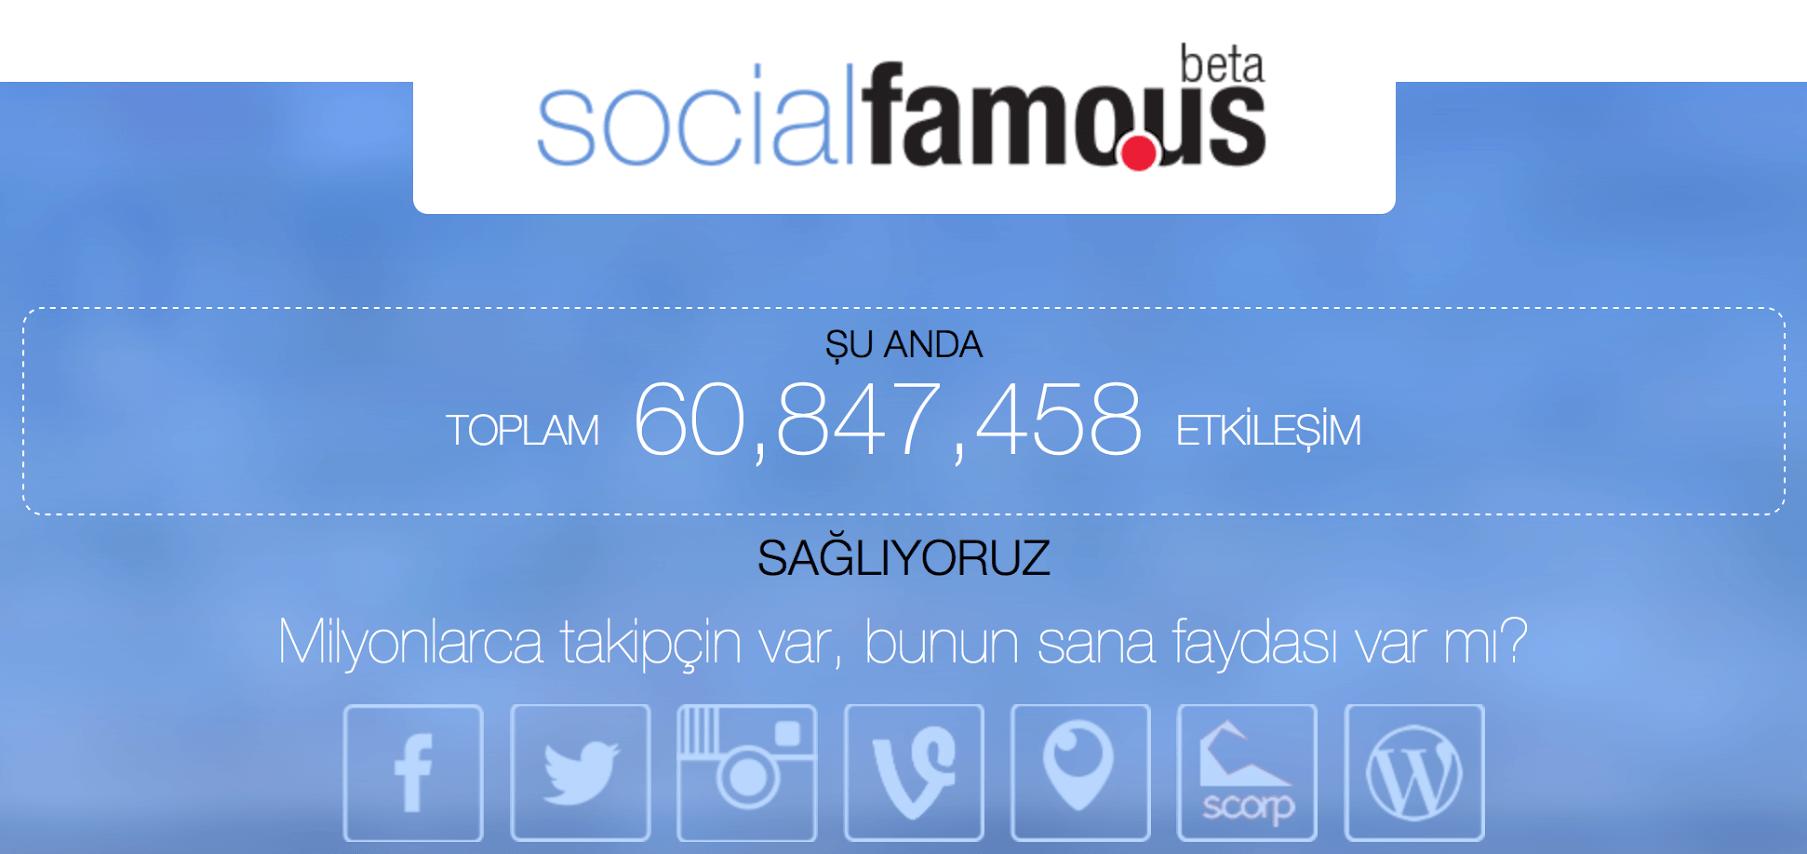 SocialFamous-gorsel